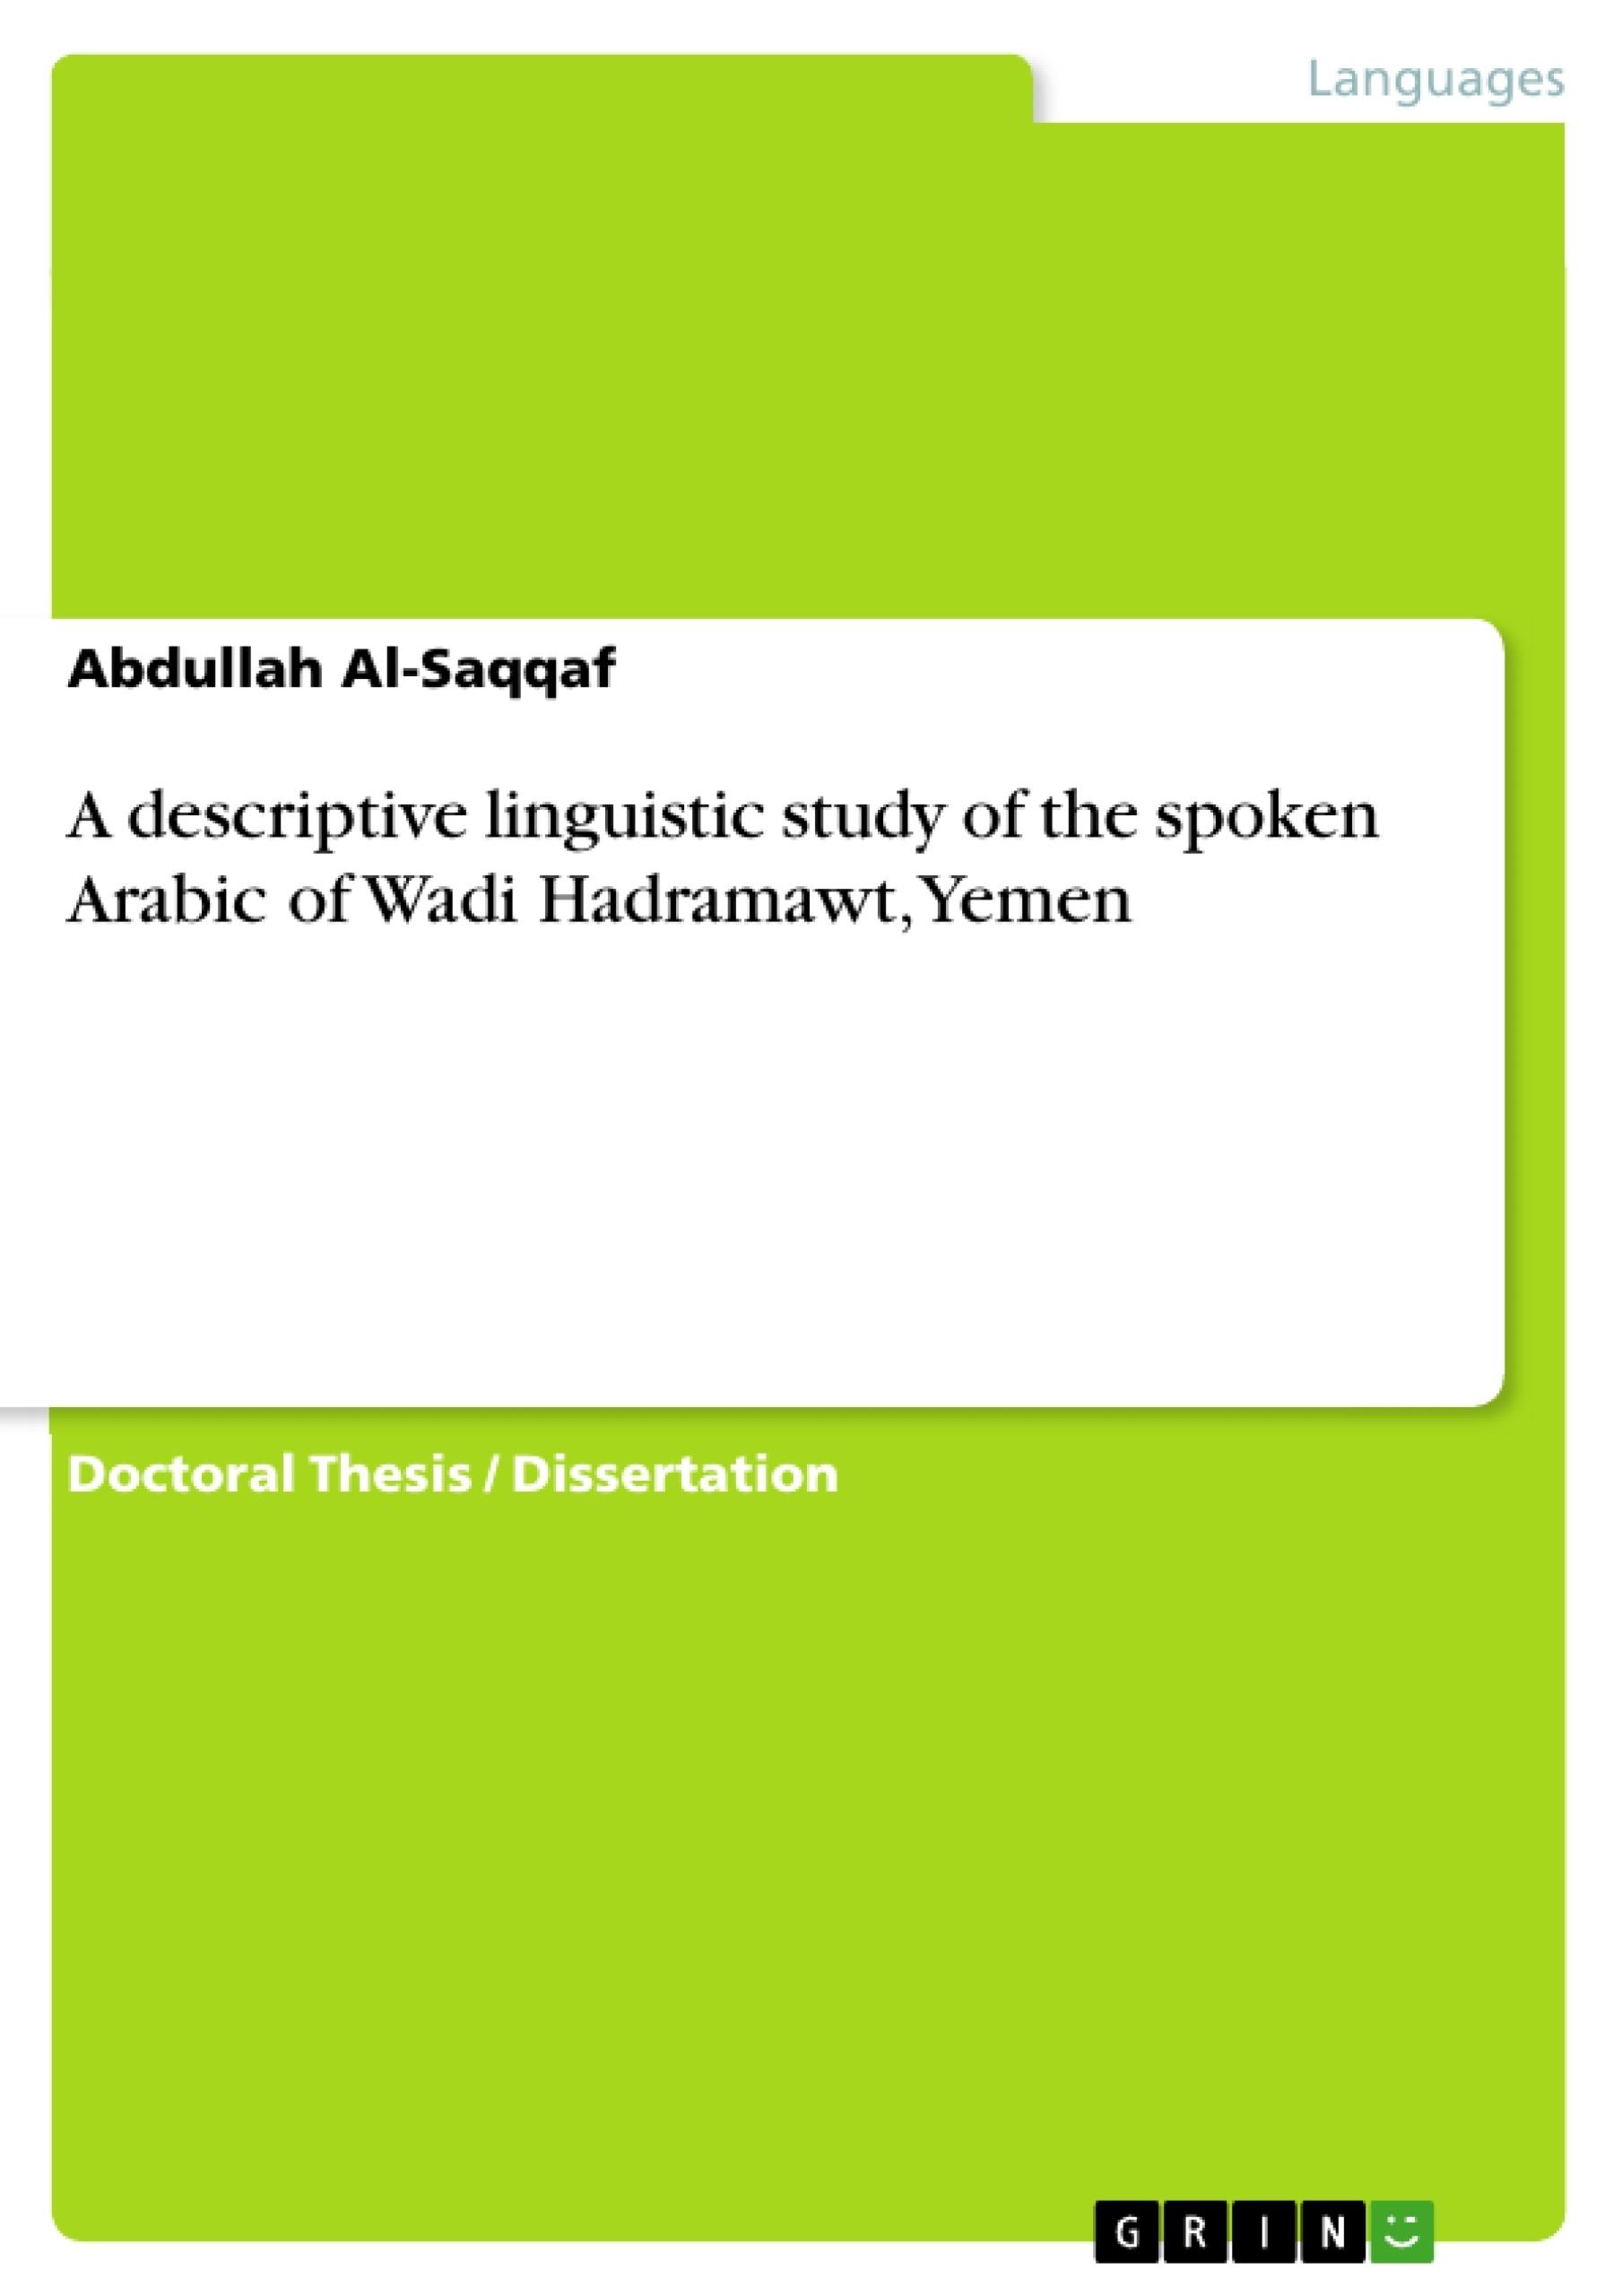 Title: A descriptive linguistic study of the spoken Arabic of Wadi Hadramawt, Yemen